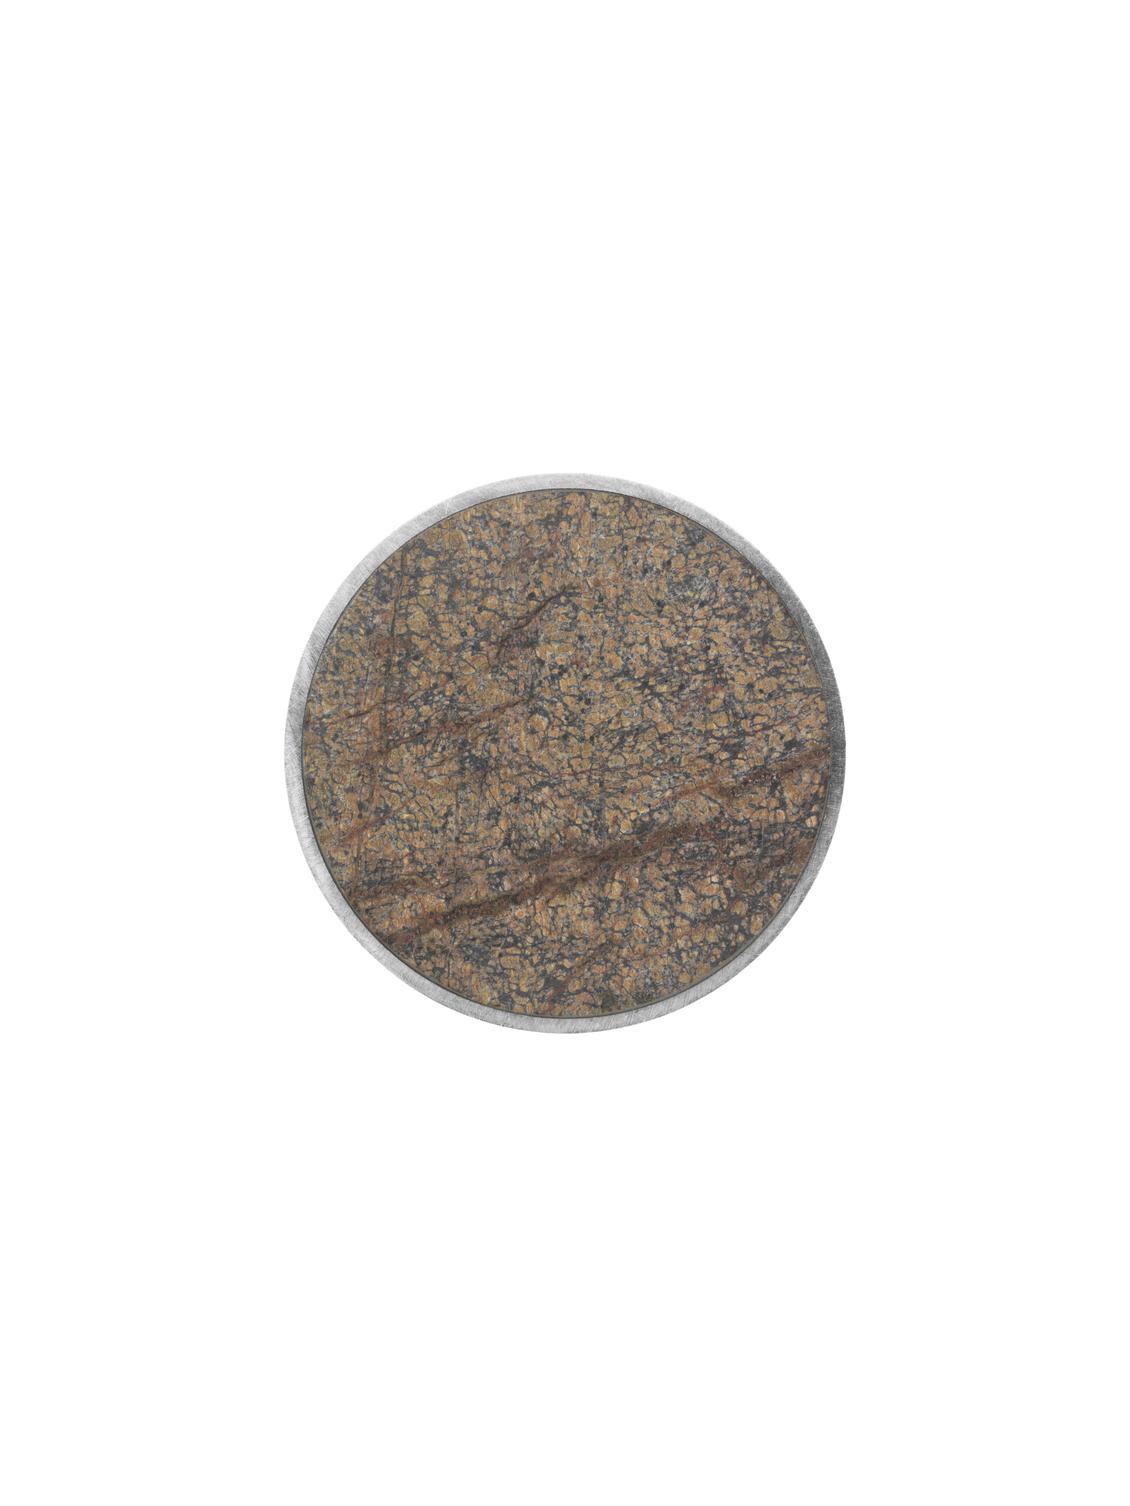 Ferm Living Hook Steel Stone Bidasar Brown large